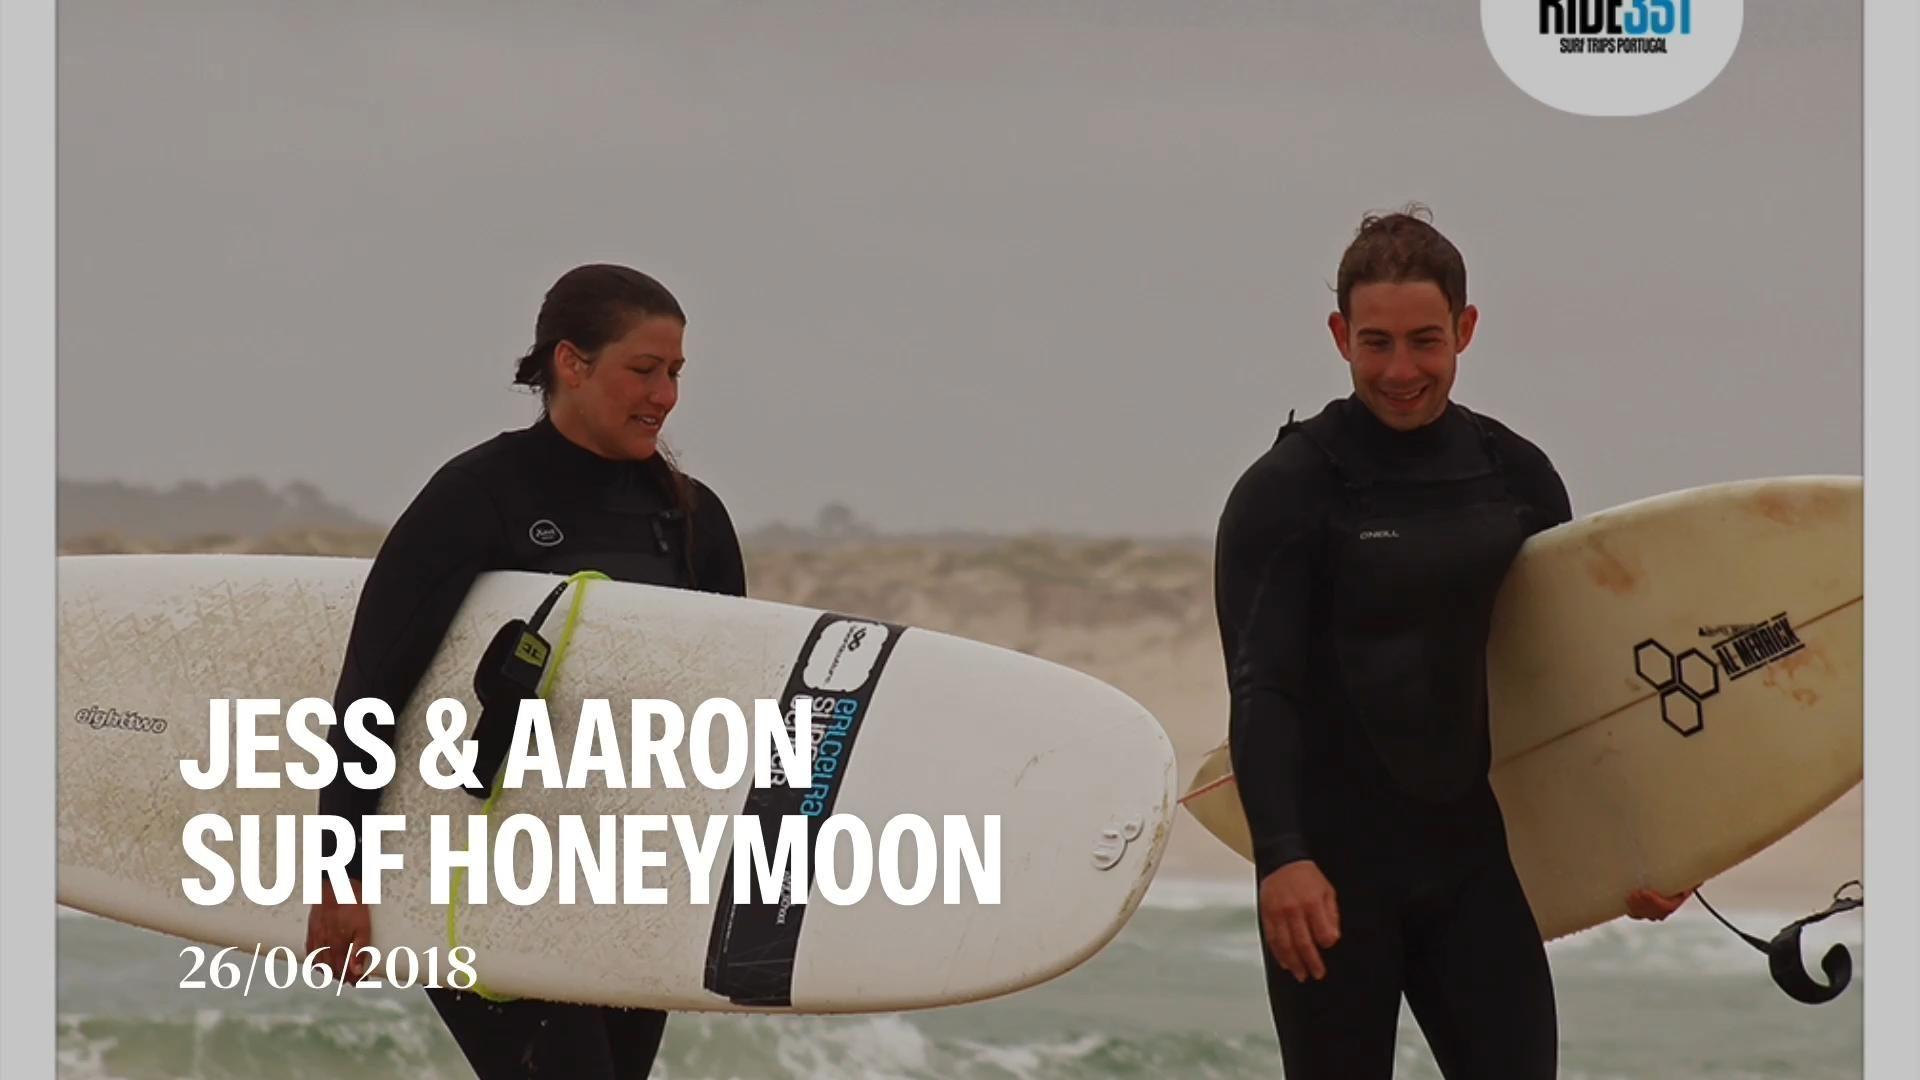 Tbt To Jess Aaron Surf Honeymoon In Portugal Video In 2020 Surfing Surf Trip Honeymoon